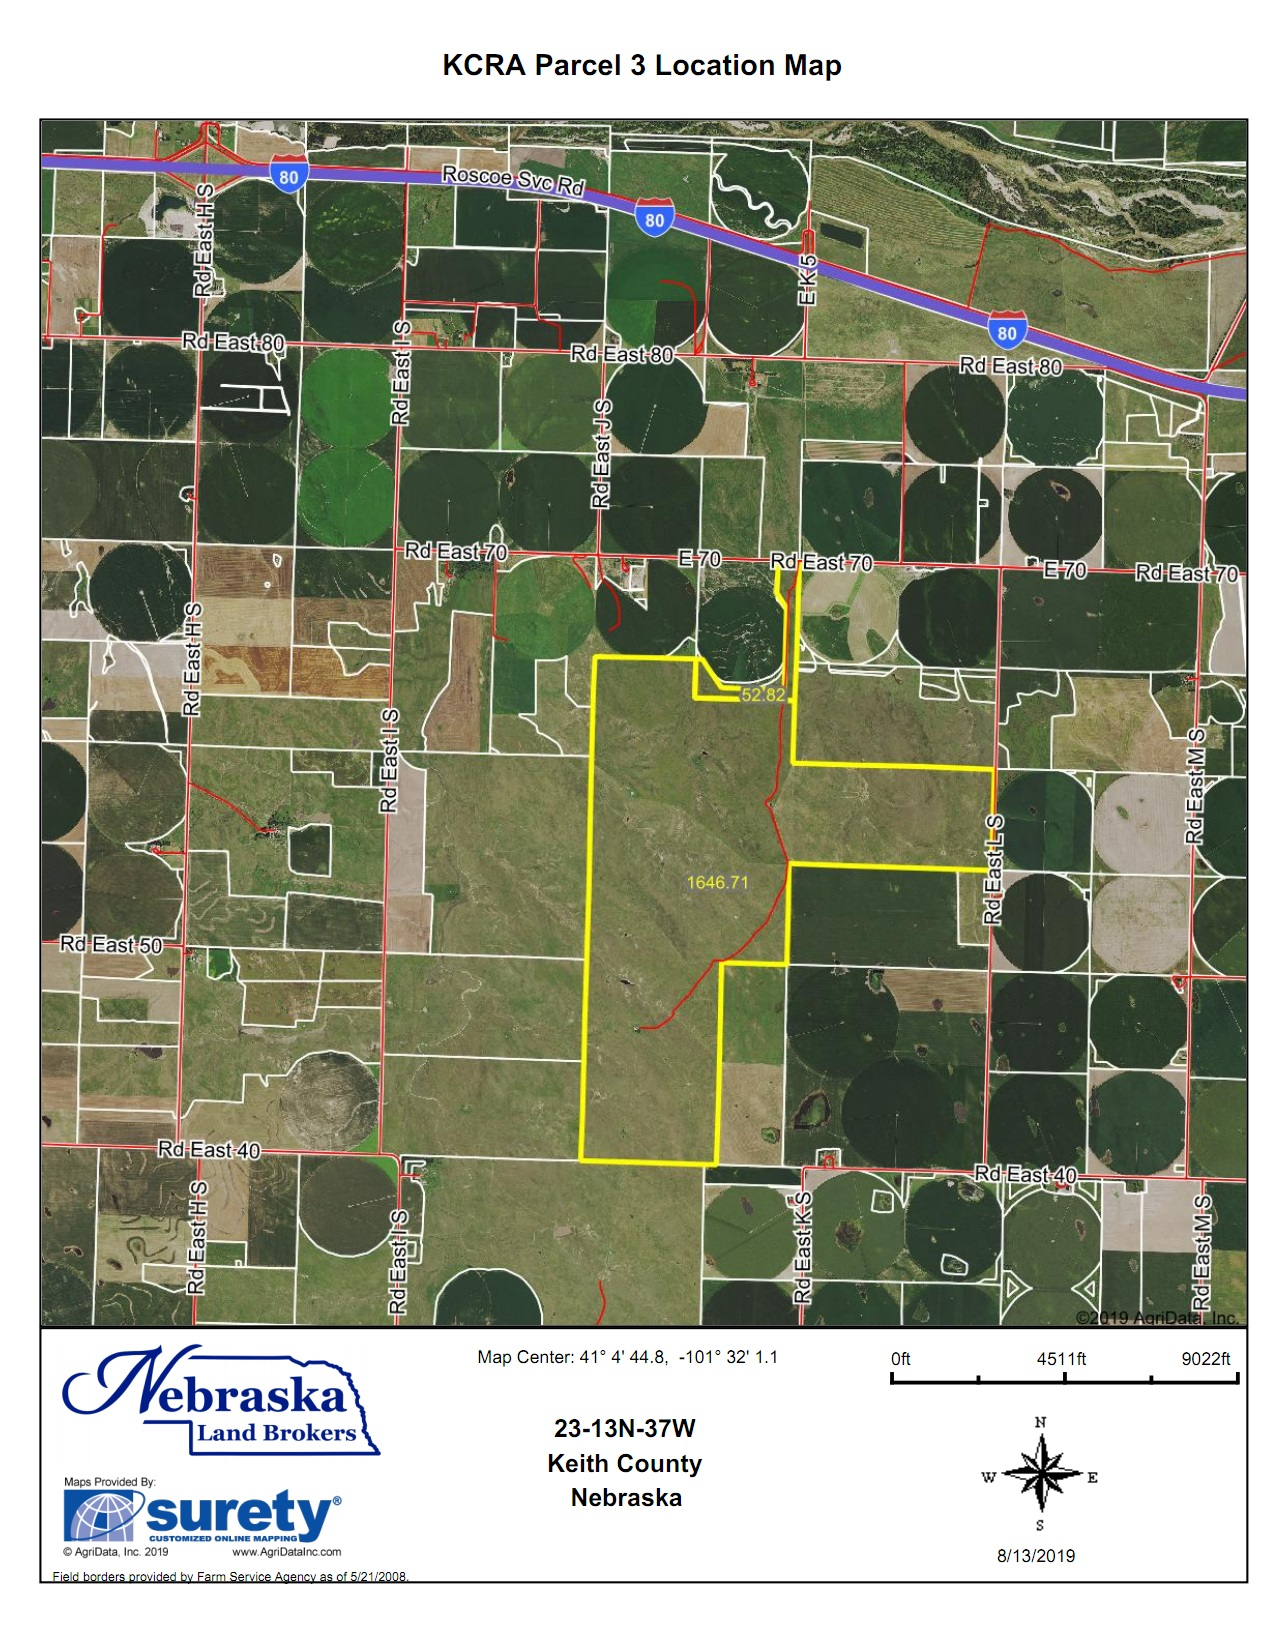 Parcel 3 location map.jpg